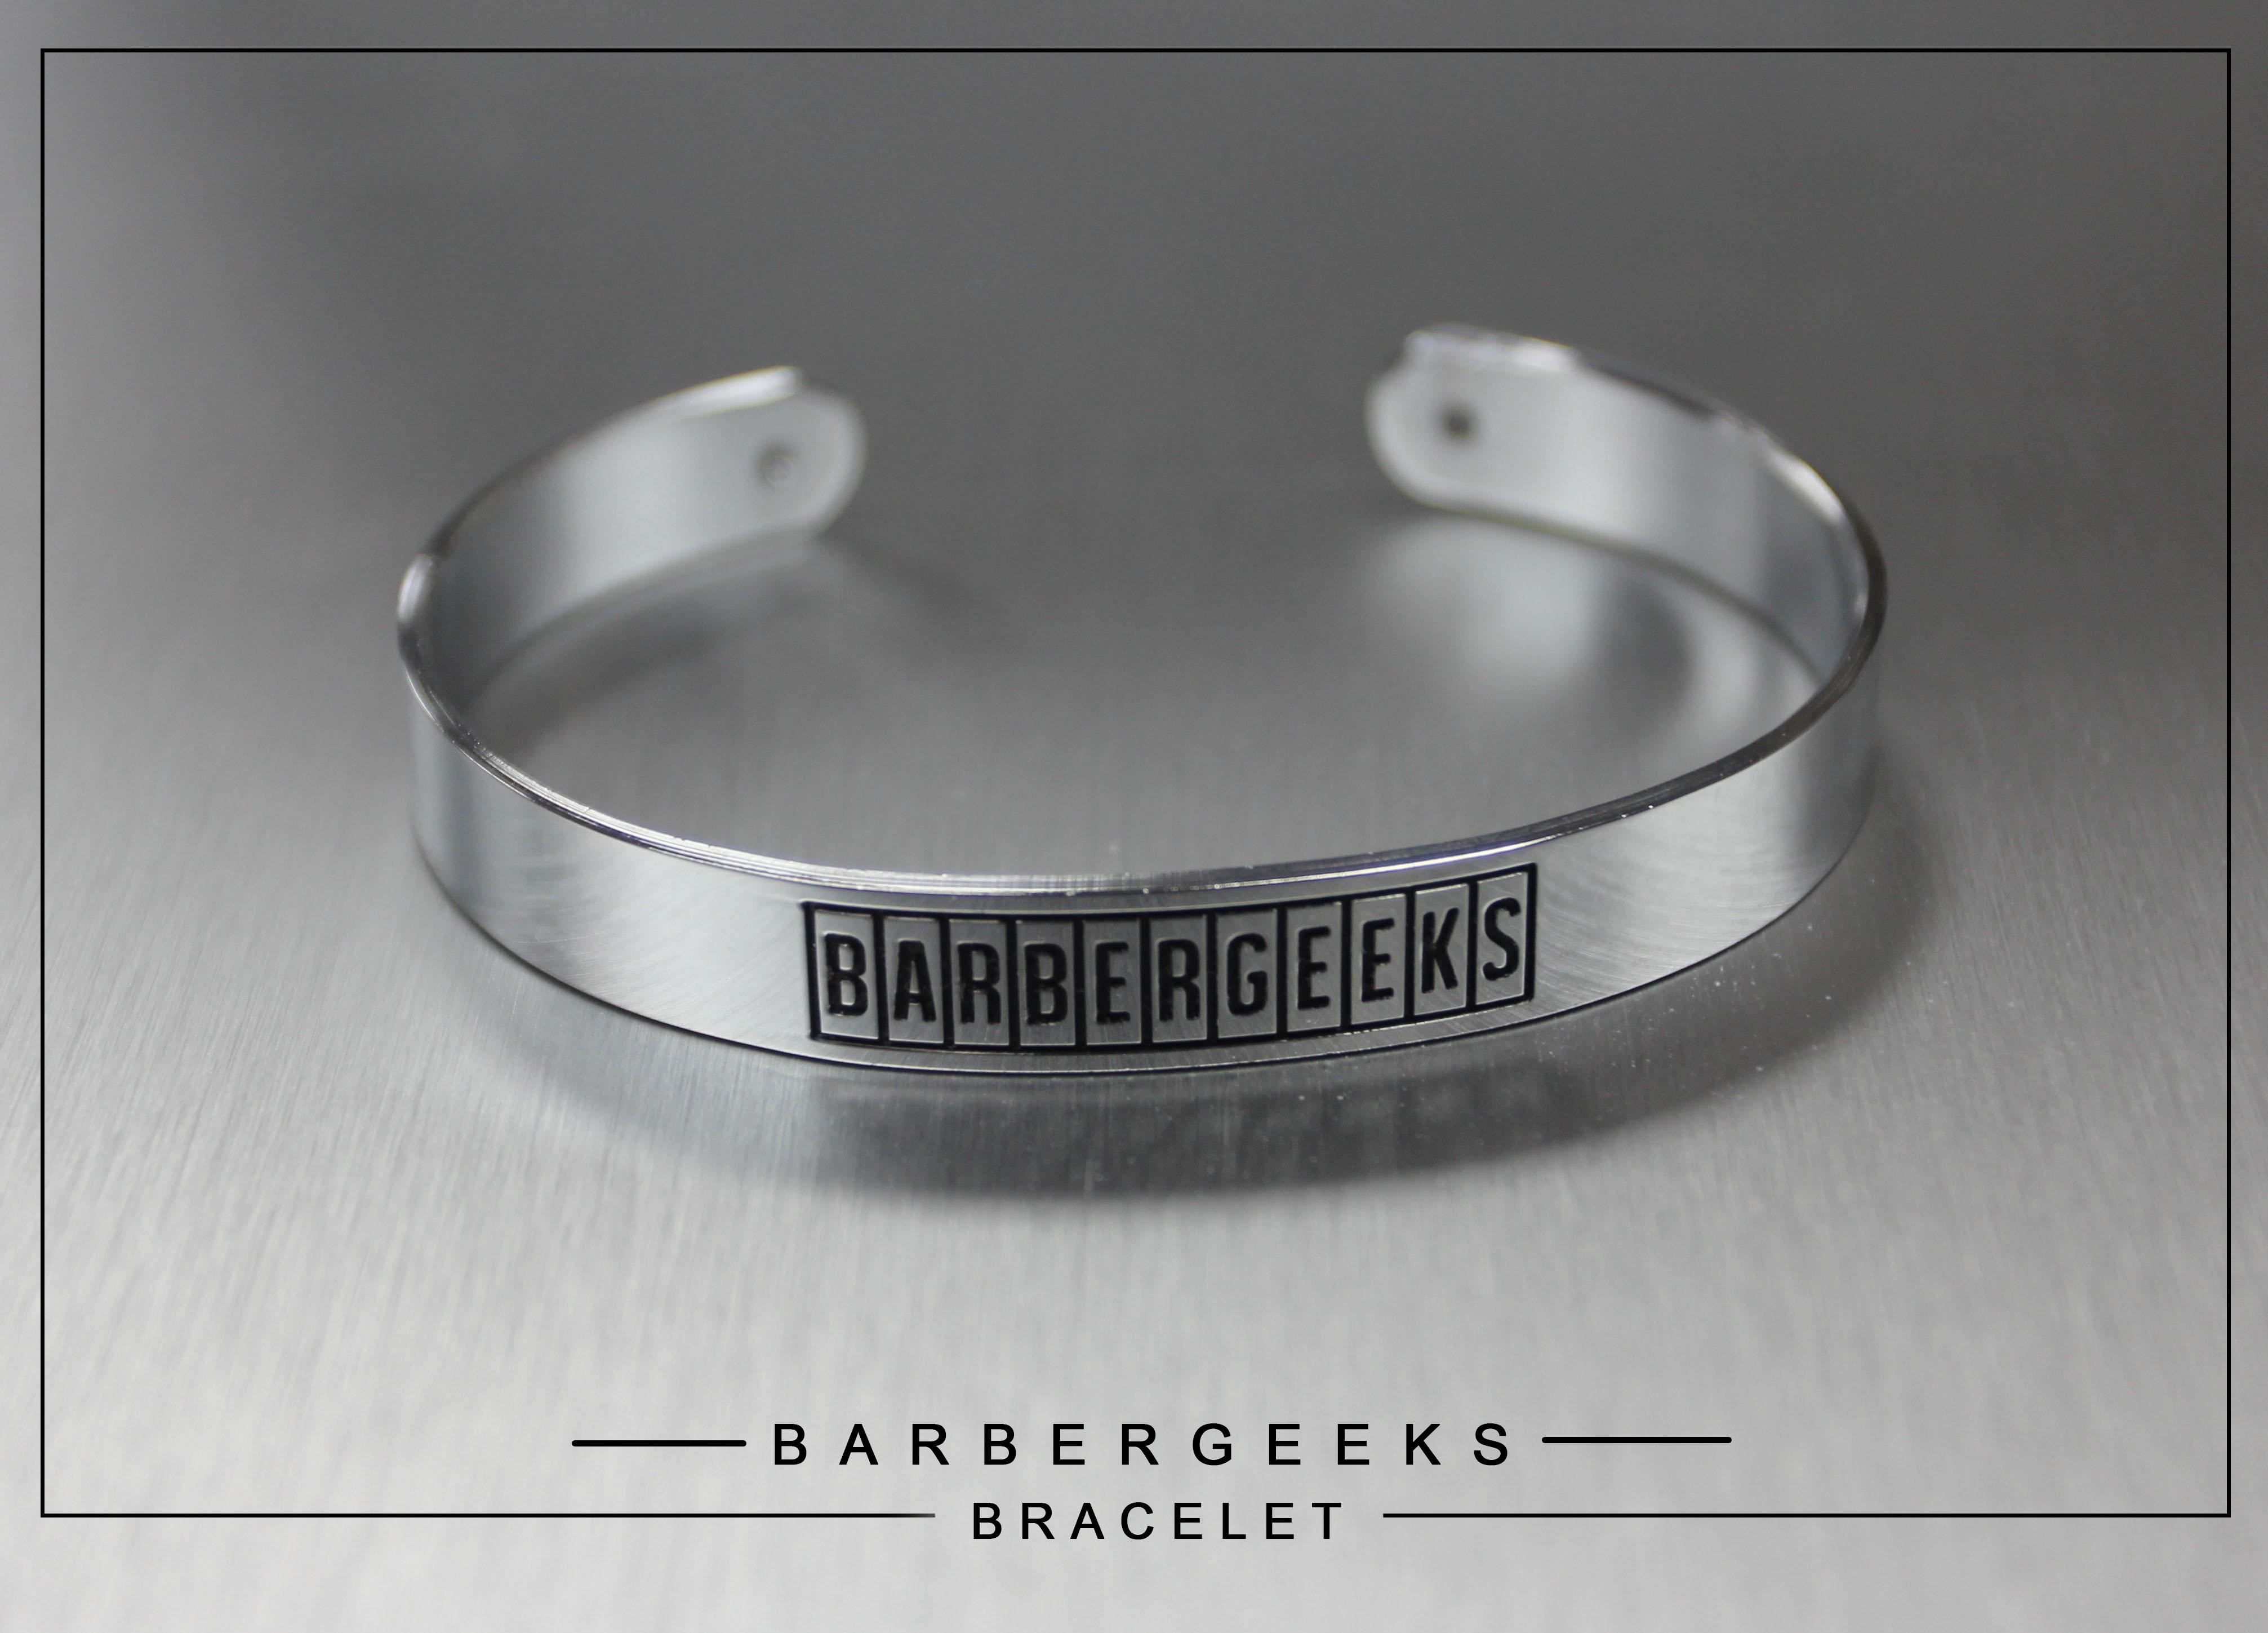 Barbergeeks Bracelet